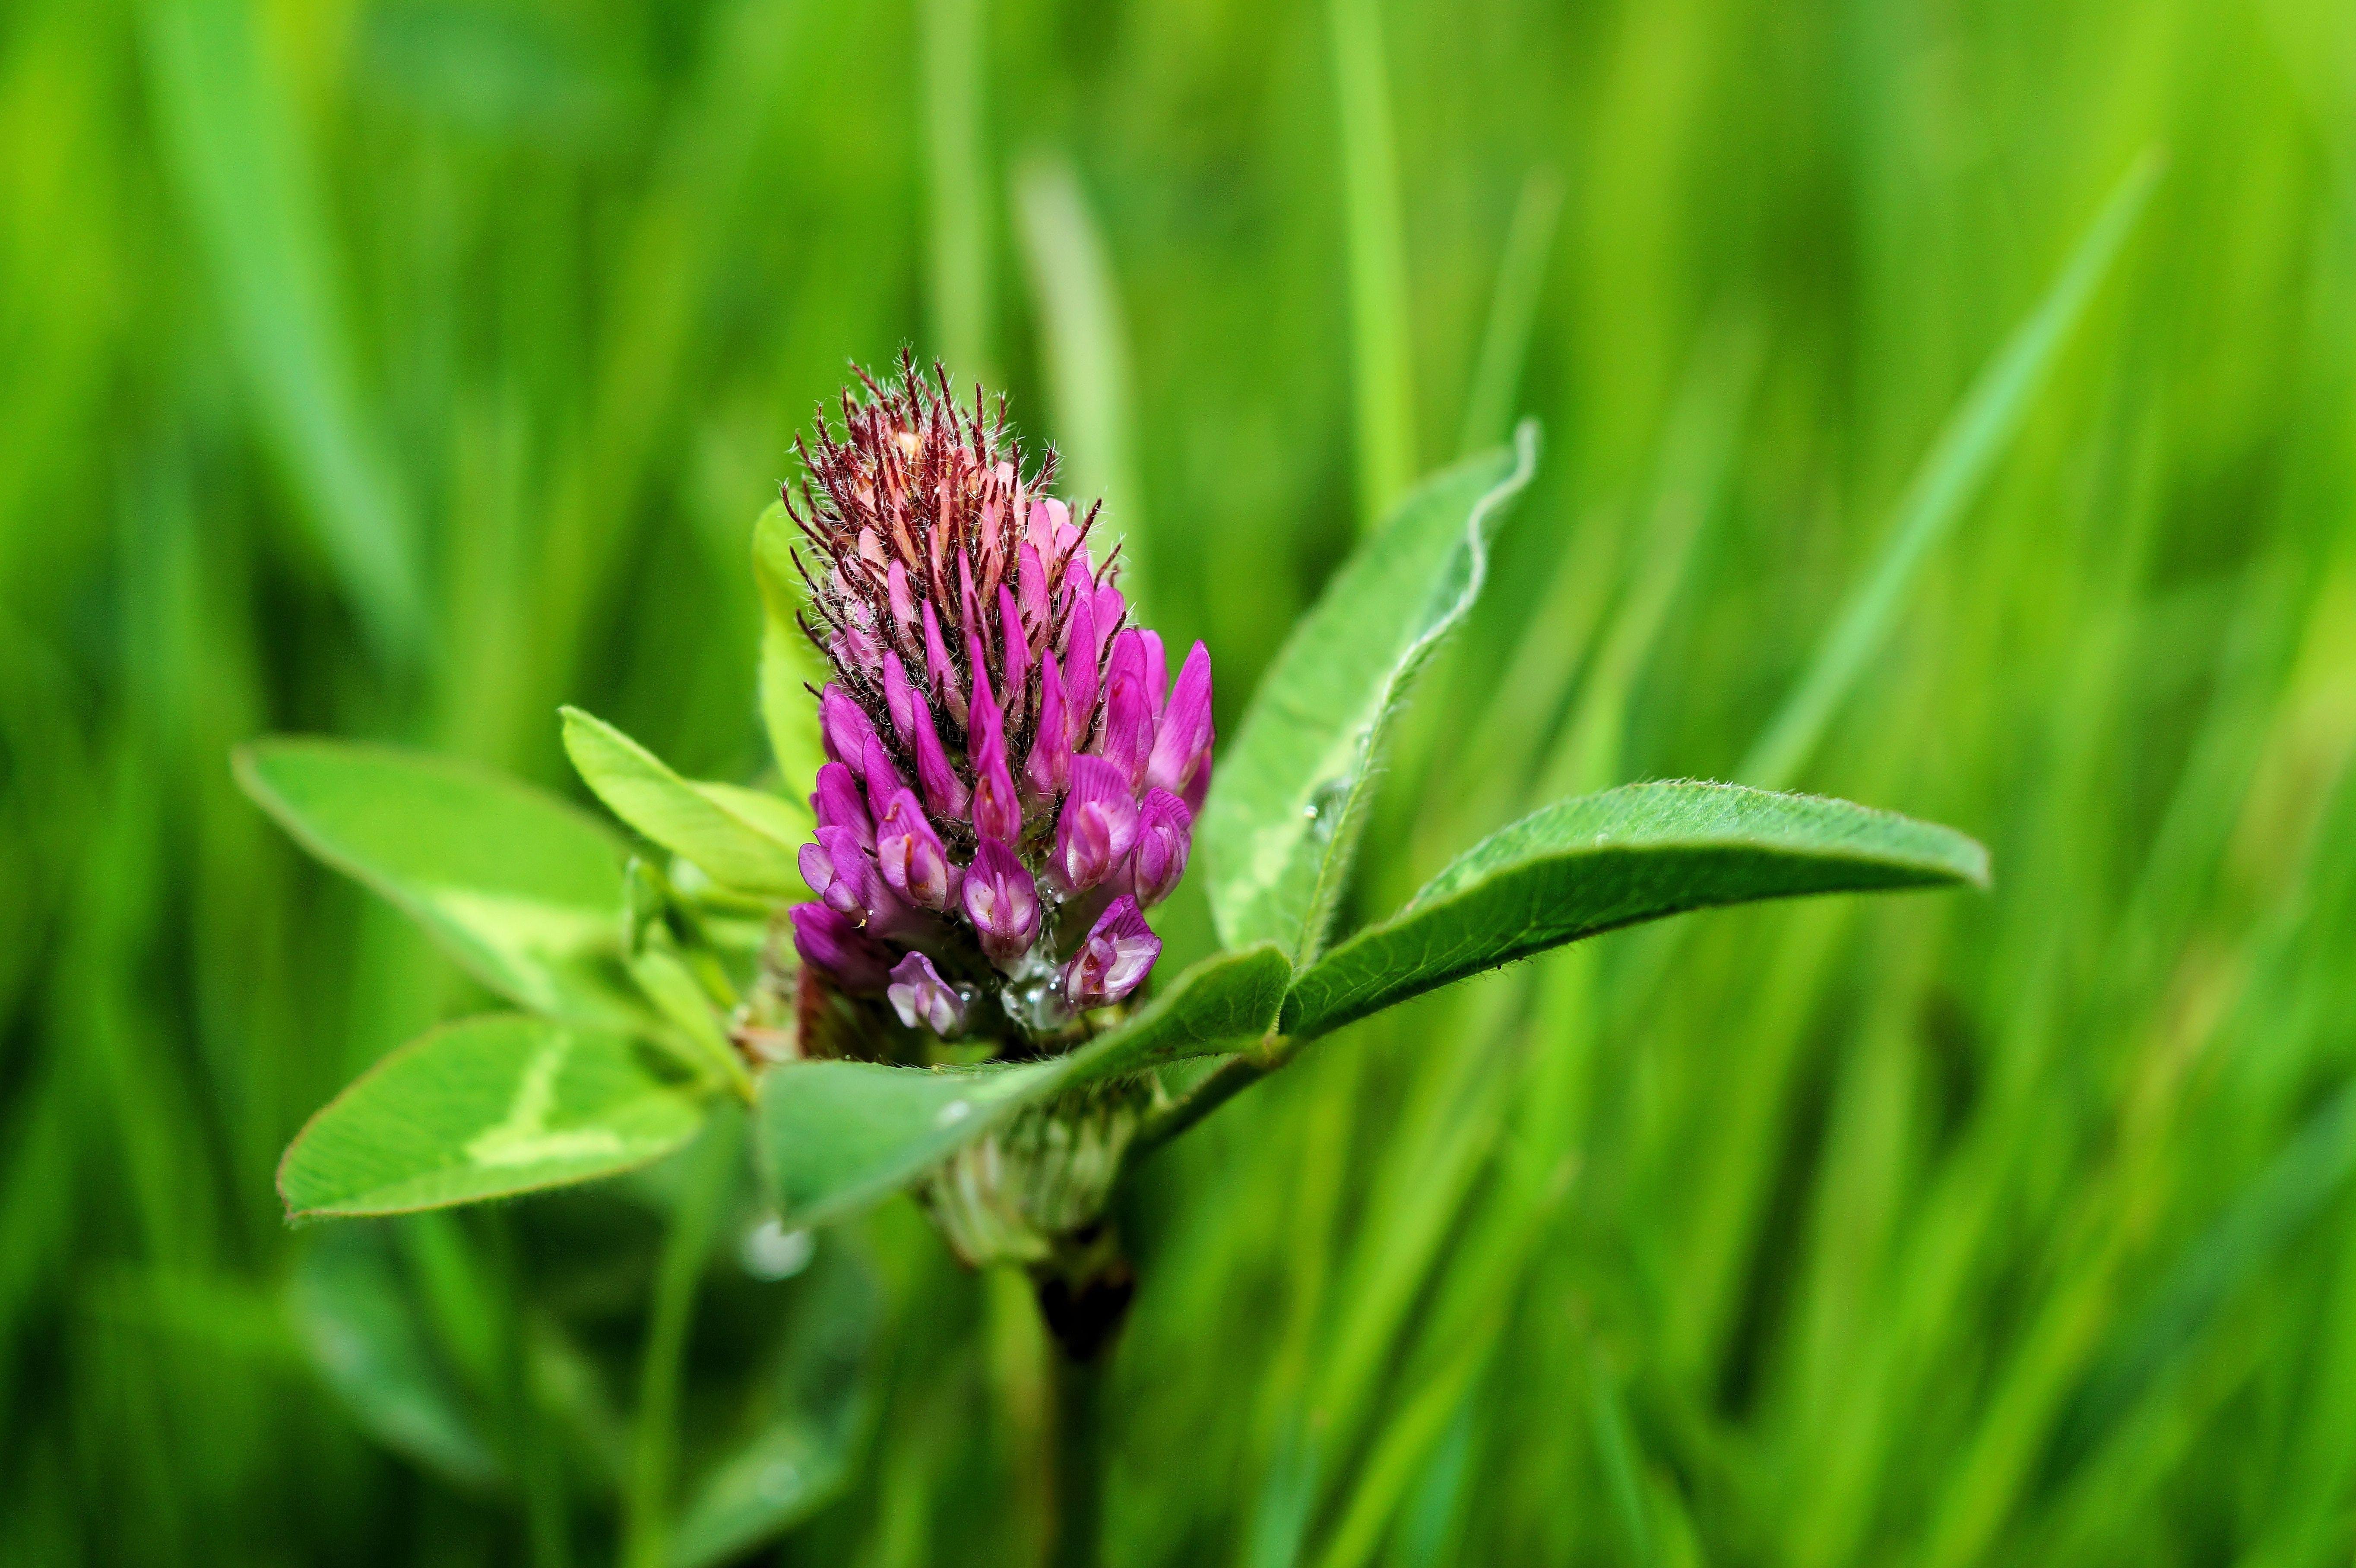 Purple Petal Flower on Green Grass